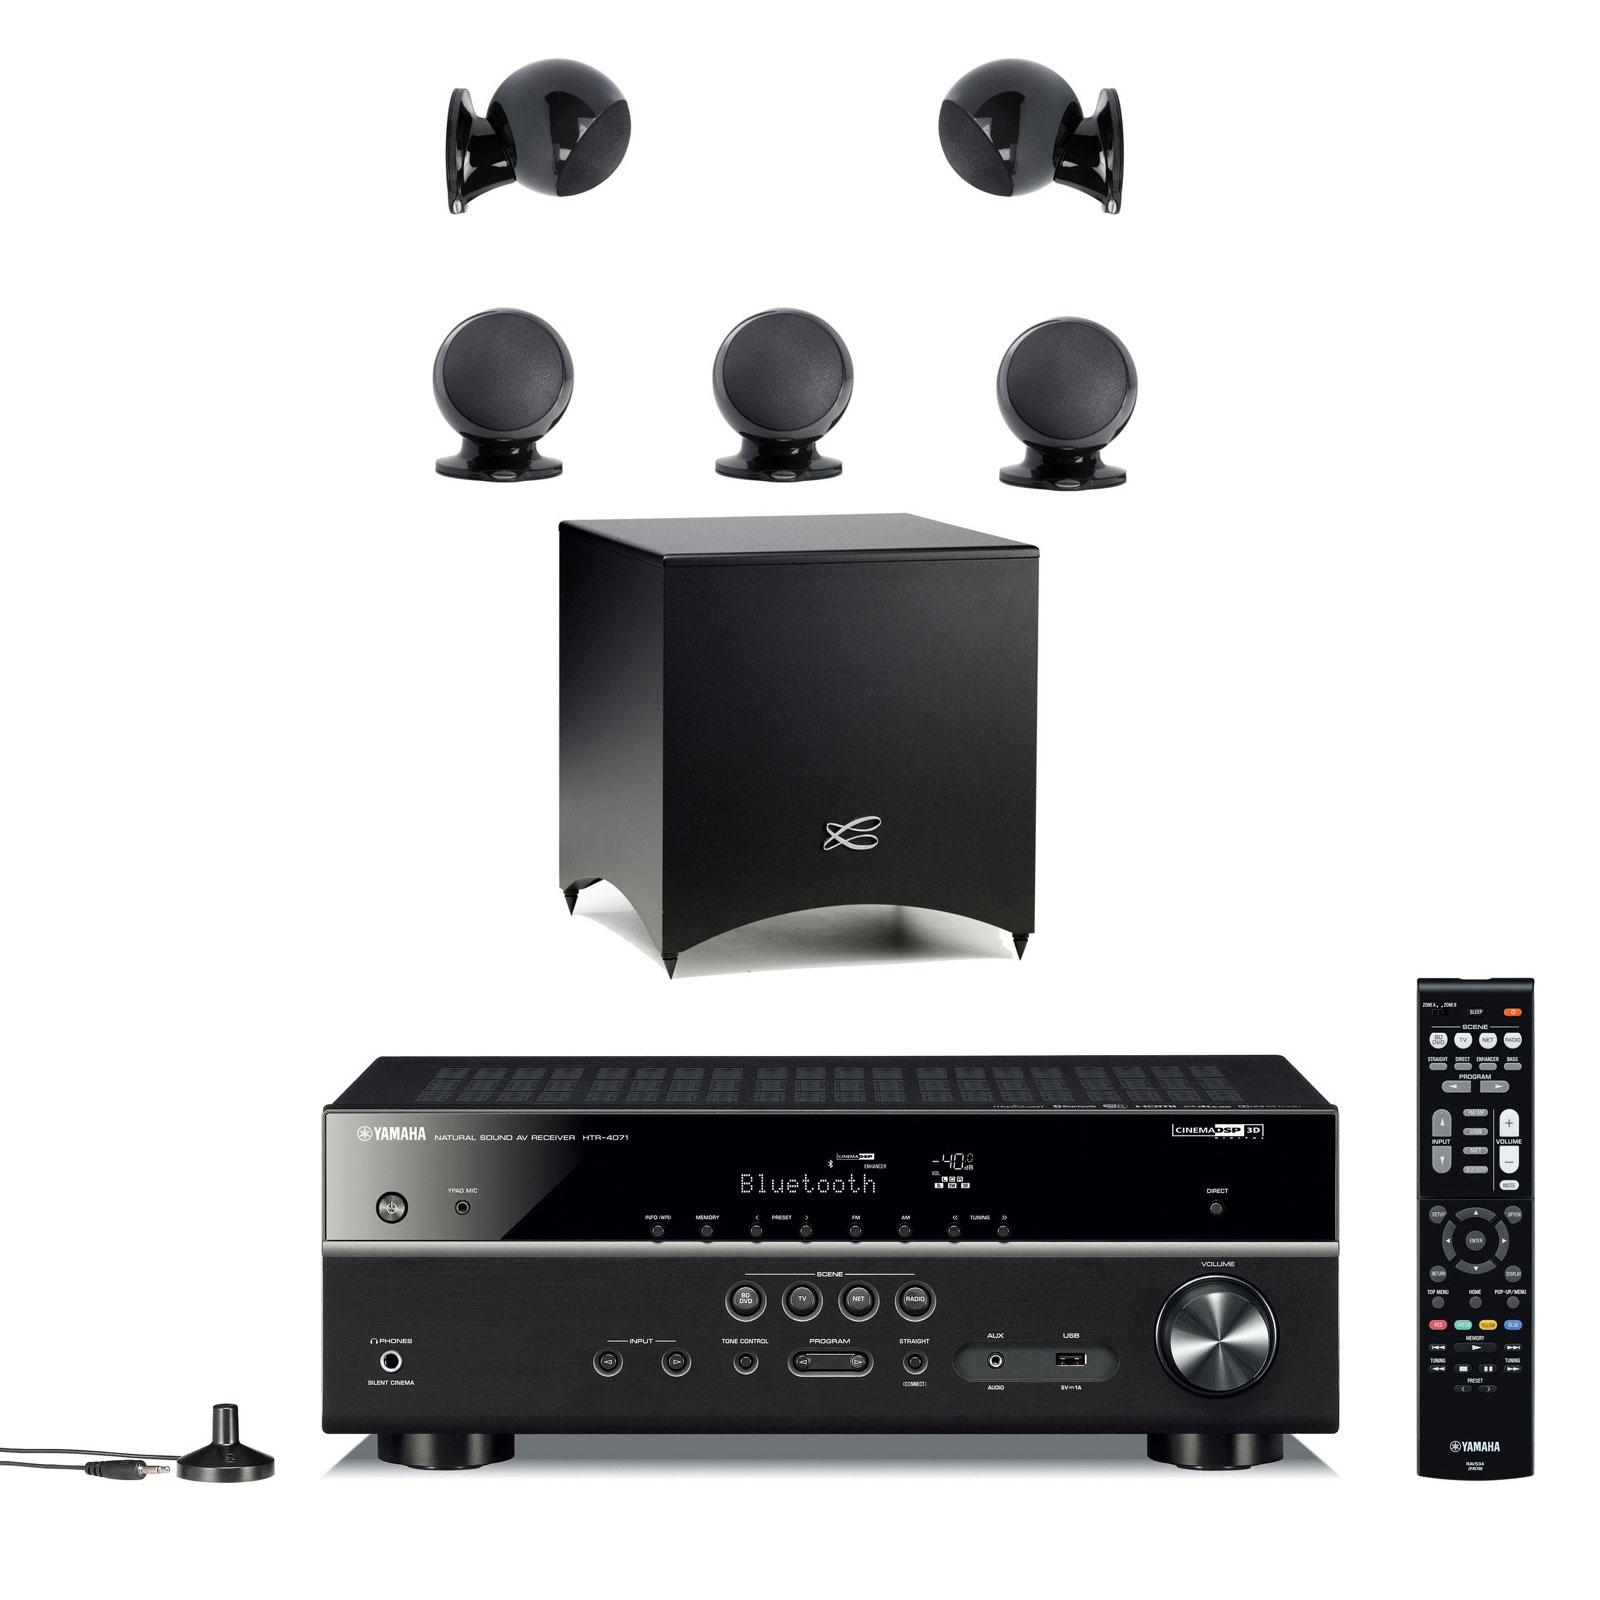 Ensemble home cinéma Yamaha HTR-4071 Noir + Cabasse Alcyone 2 Pack 5.1 Noir Ampli-tuner Home Cinéma 5.1 3D-Ready avec HDMI 2.0, HDCP 2.2, Ultra HD 4K, Wi-Fi, Bluetooth, DLNA, AirPlay et MusicCast + Pack d'enceintes 5.1